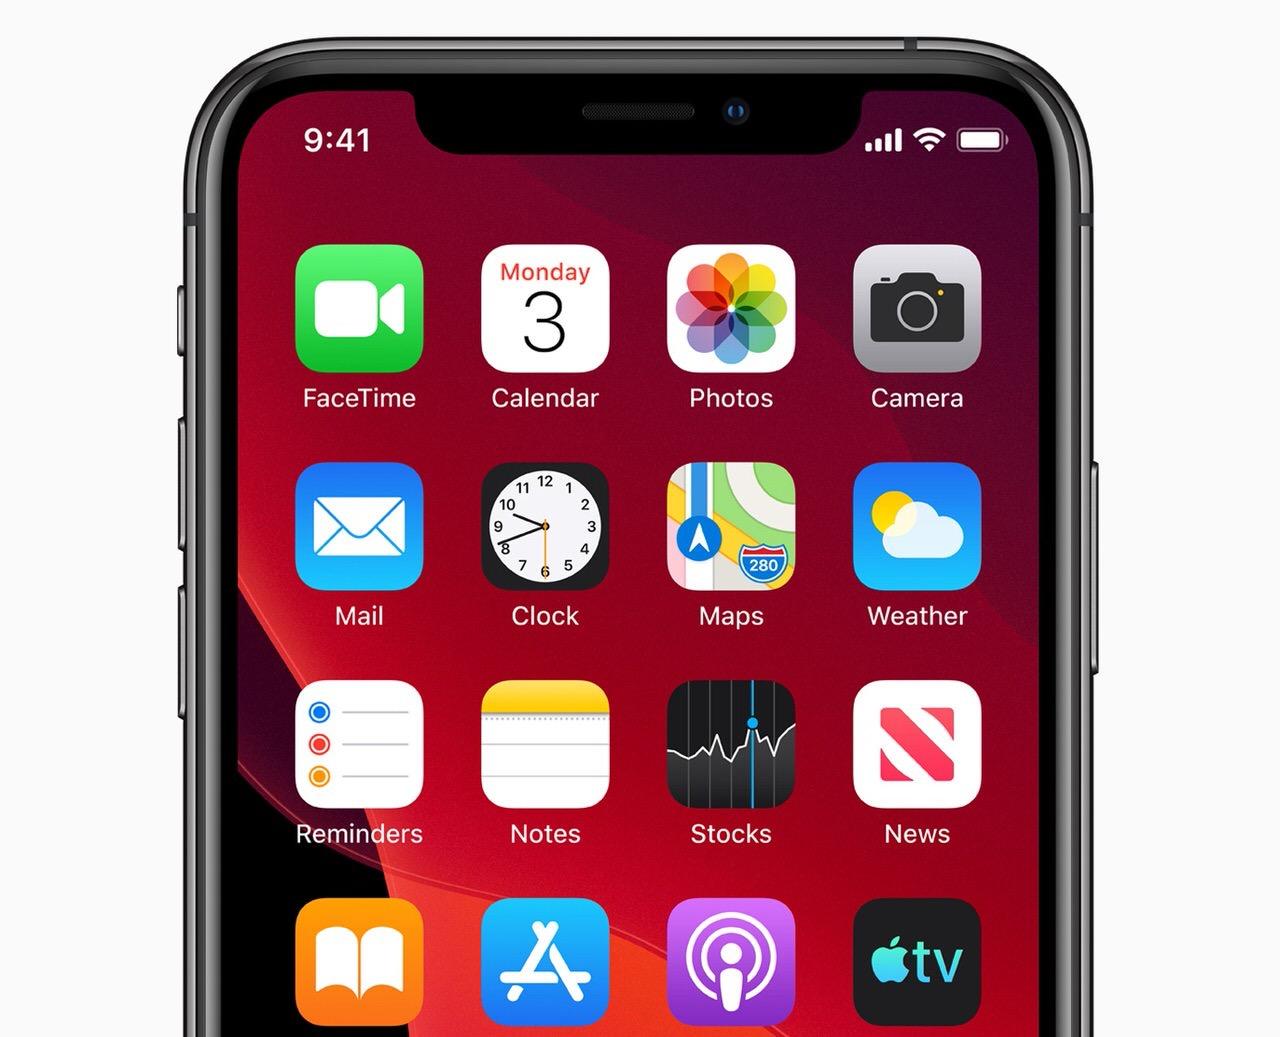 【iOS 13】iPhone 5s/6/6 Plusには非対応 〜iPhone SEは対応